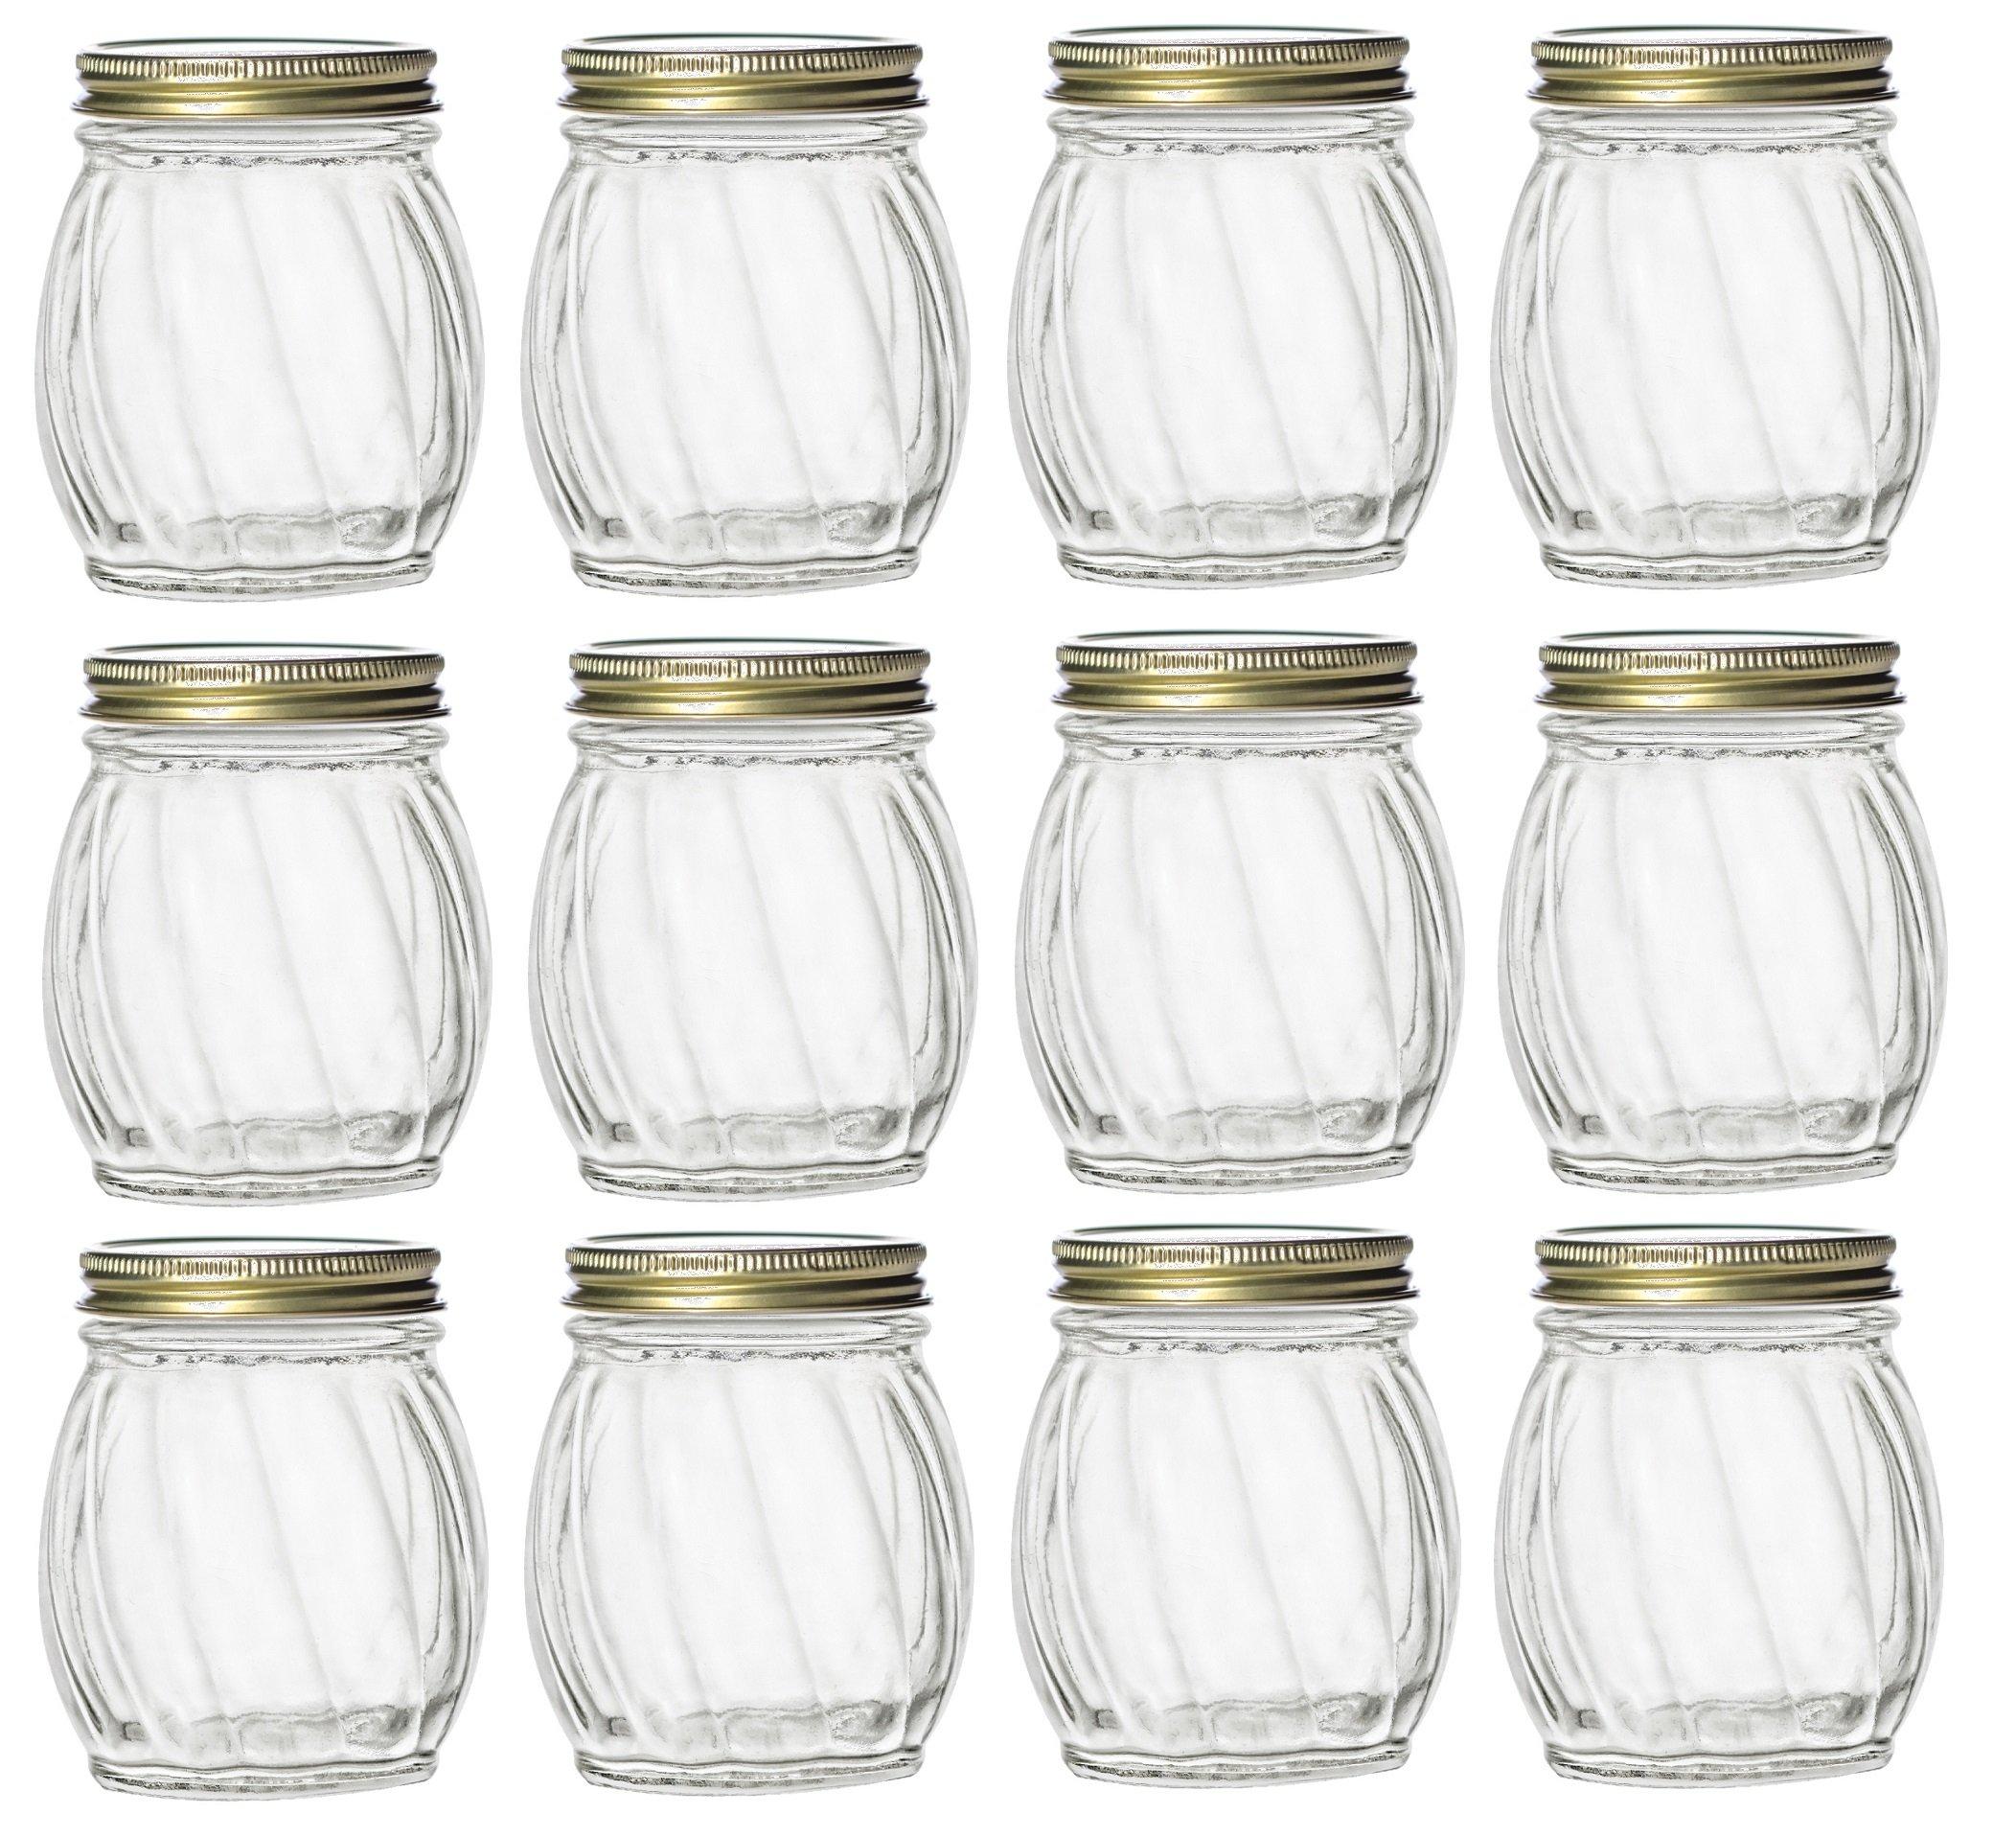 9e06ca687d0b Nakpunar 12 pcs 5 oz Twirl Round Glass Jars with Gold Lids - Canning ...